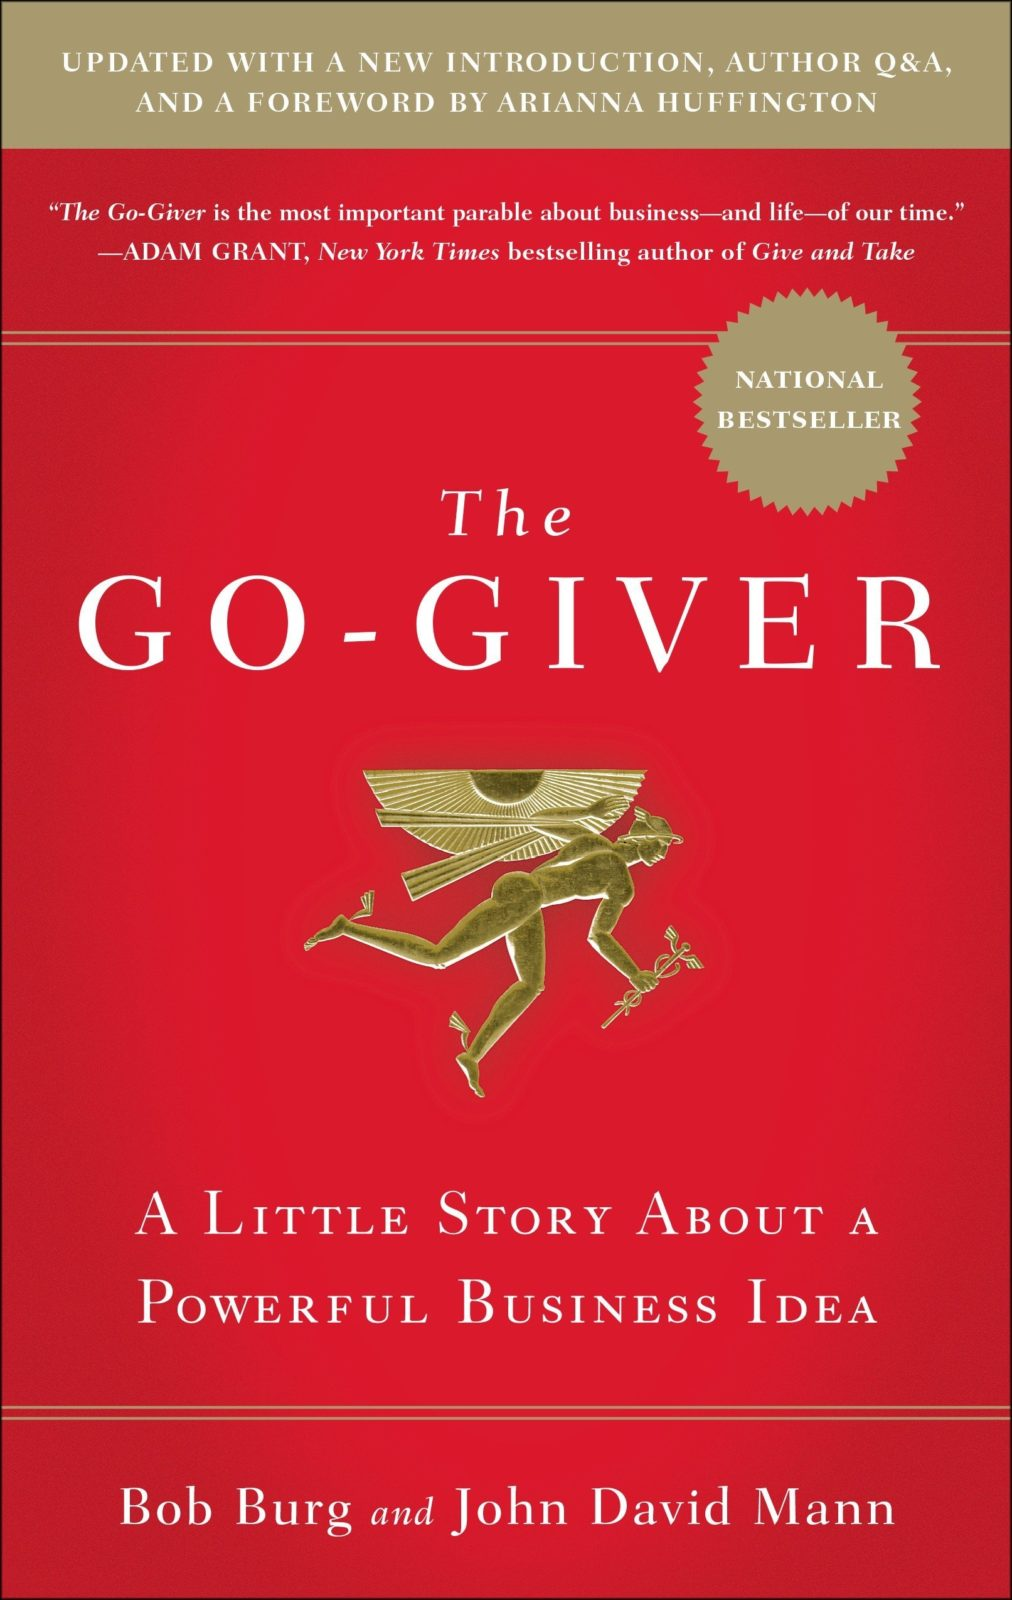 The-Go-Giver-1012x1600.jpg